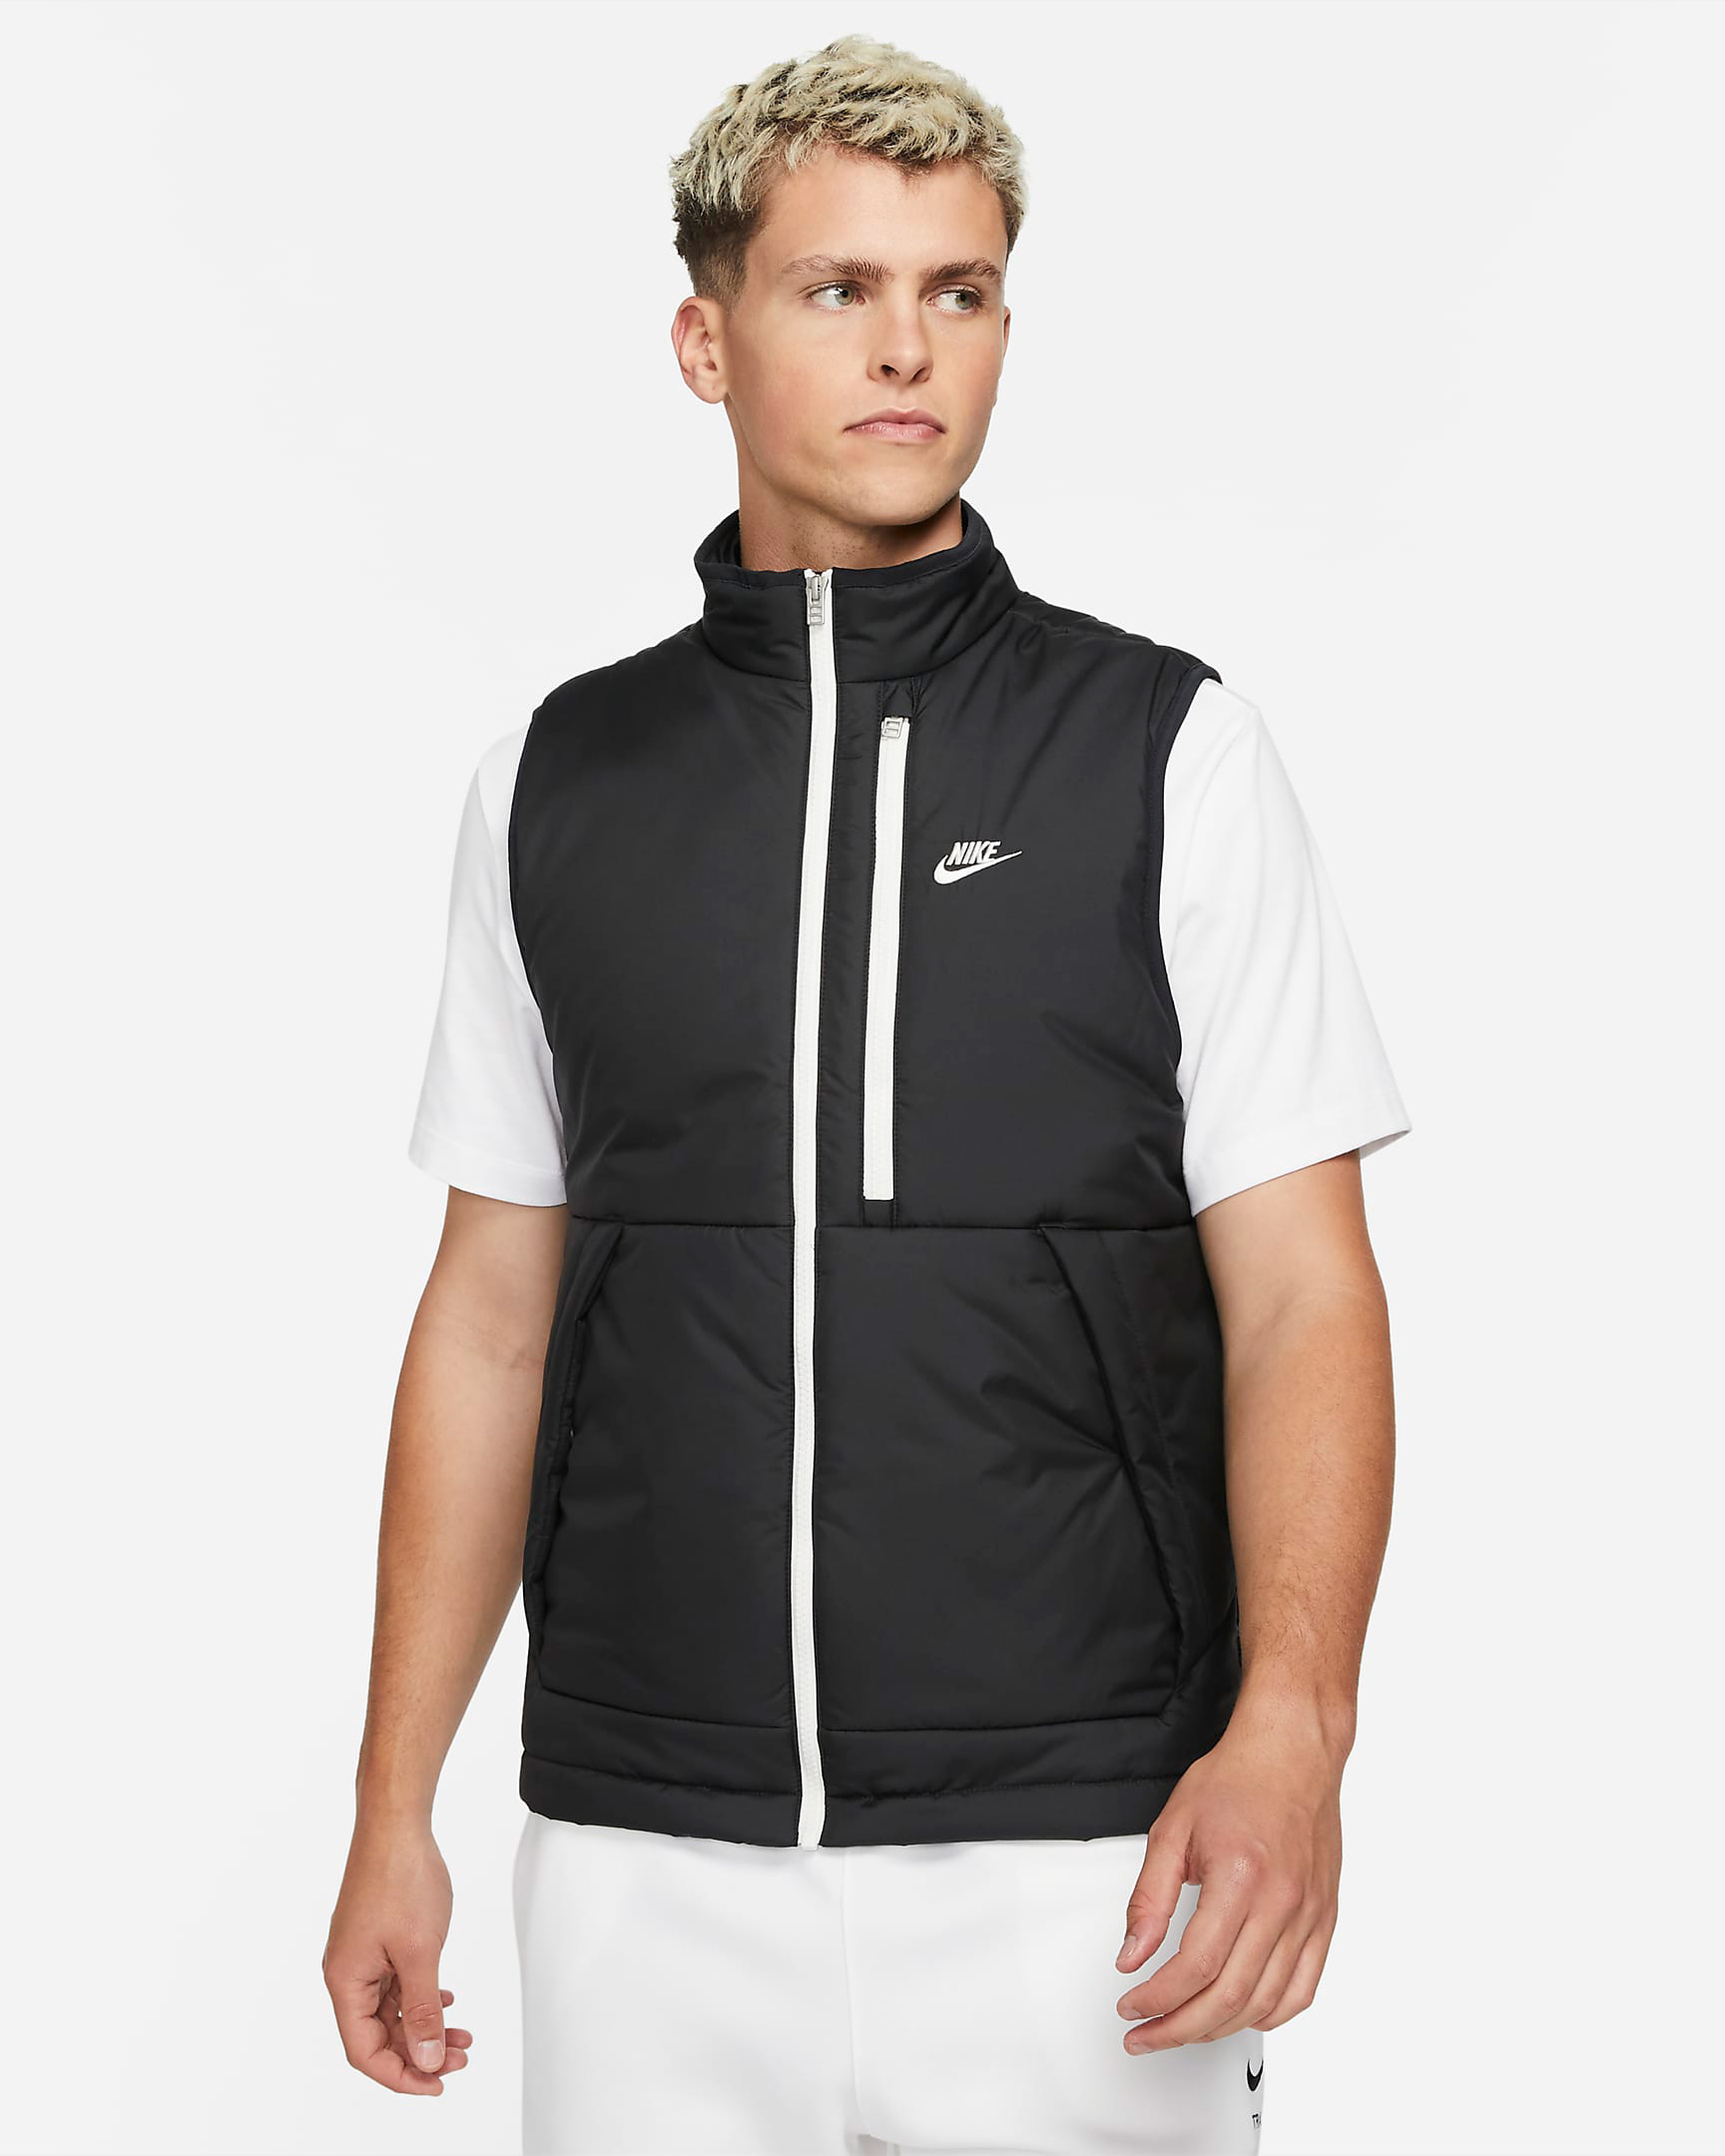 nike-sportswear-therma-fit-legacy-hooded-vest-black-sail